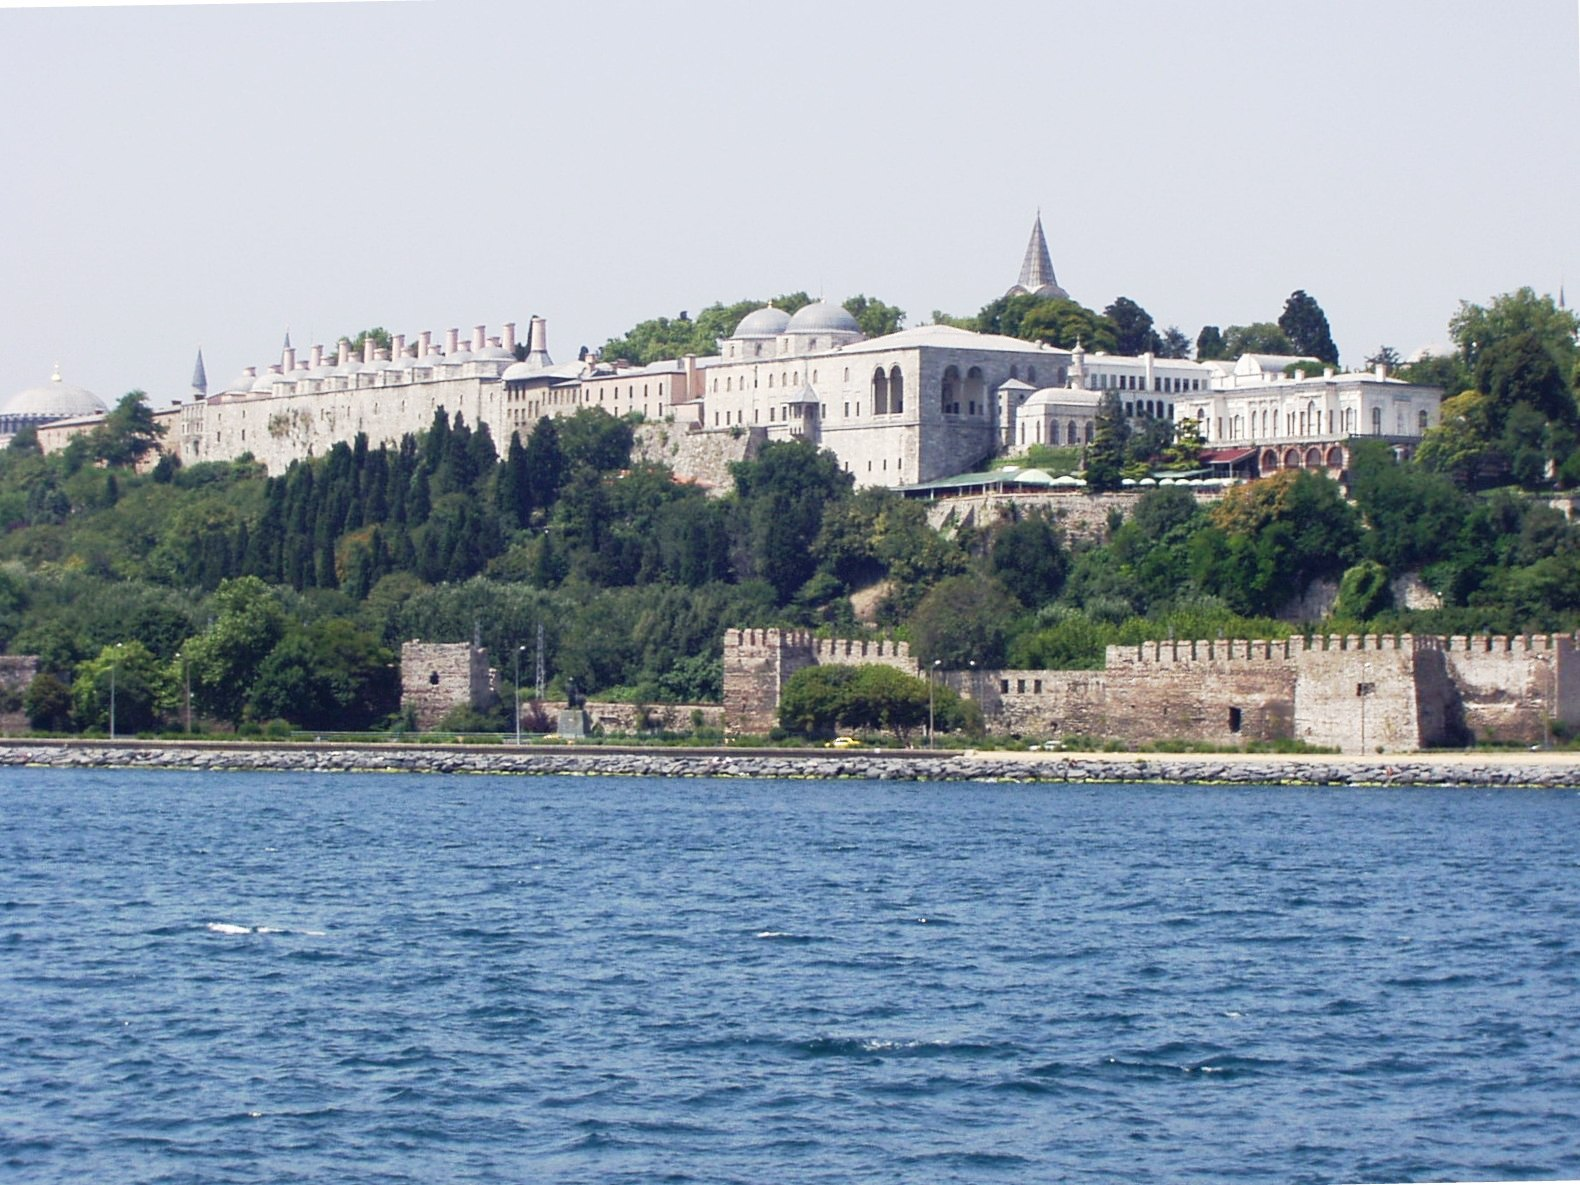 http://3.bp.blogspot.com/-8EtCeUDRAoU/UV6fMb-fryI/AAAAAAAACmI/aTePXlmrKxg/s1600/Topkapi_Palace_Bosphorus_002.JPG